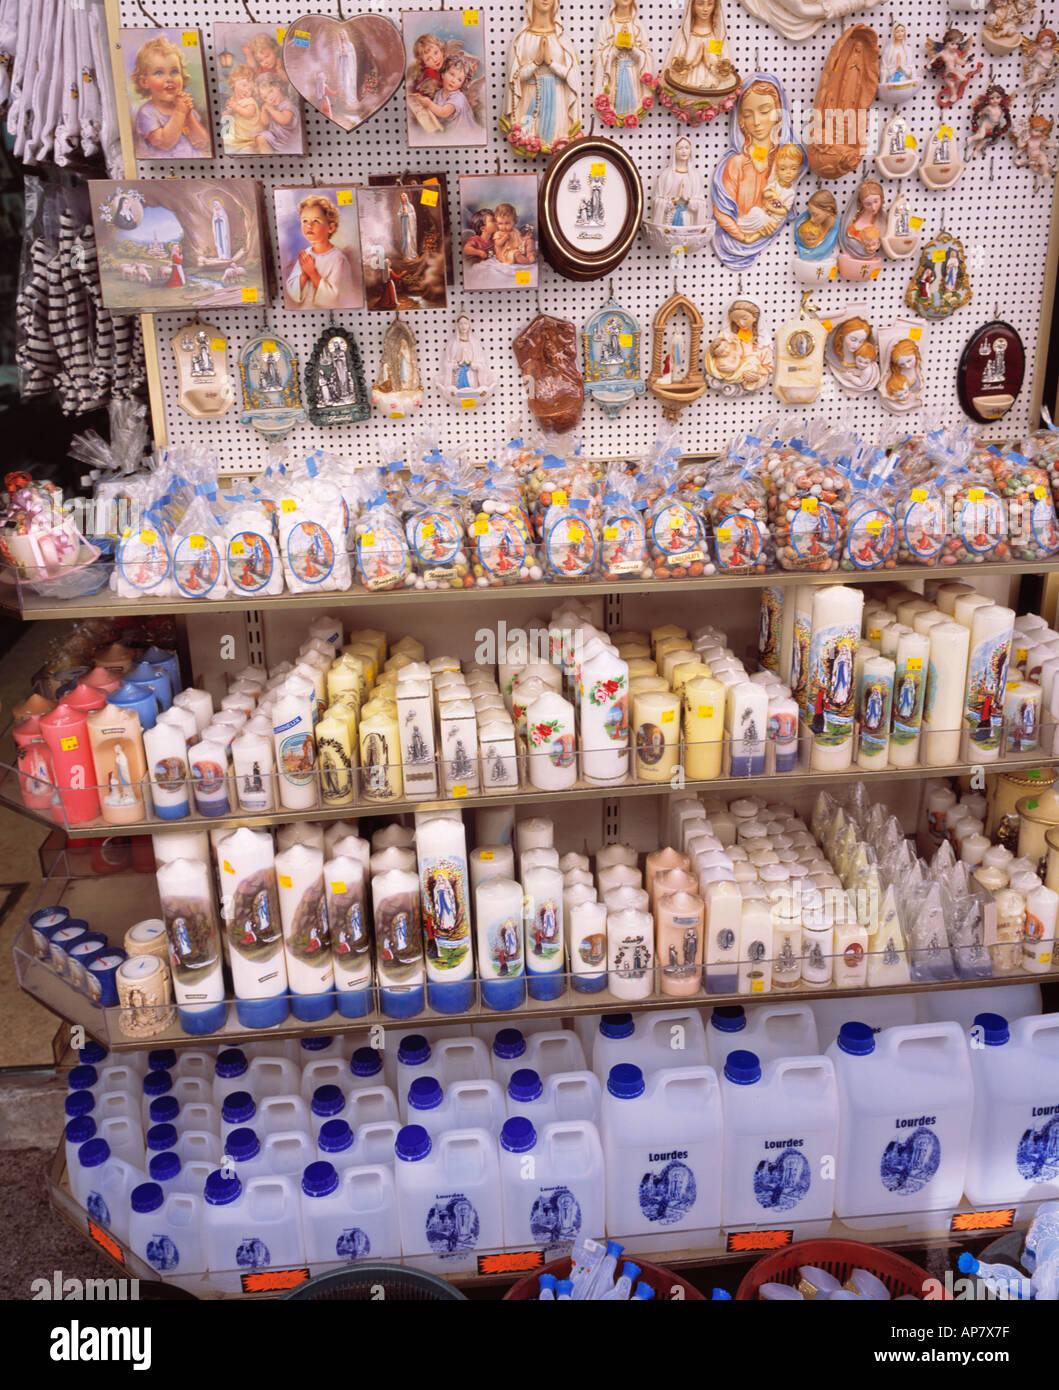 France midi pyrenees lourdes souvenirs holy water bottles stock france midi pyrenees lourdes souvenirs holy water bottles publicscrutiny Images